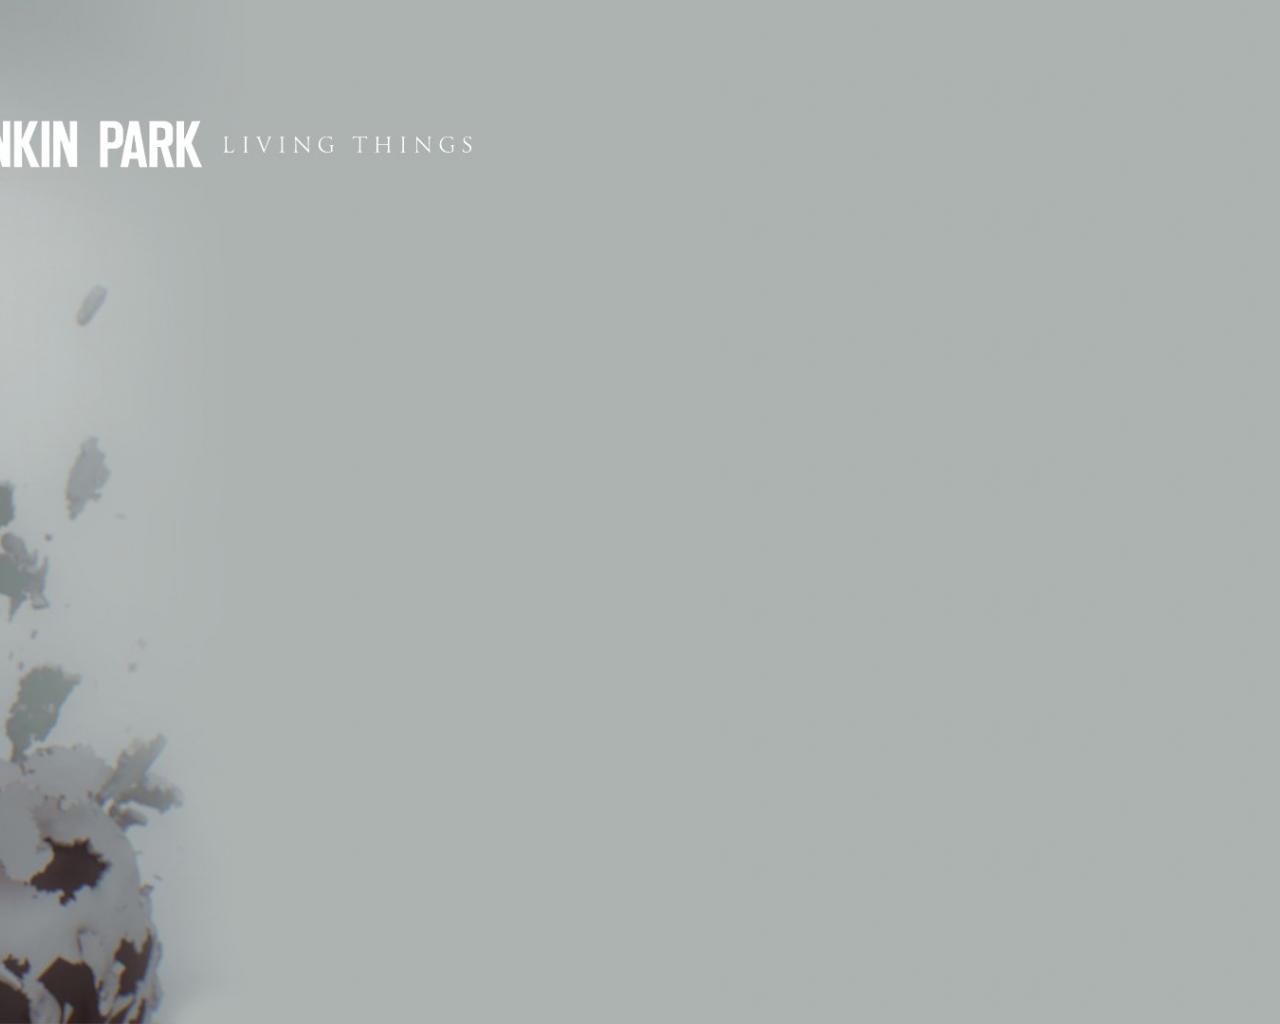 Free Download Celeb Wallpaper Hd Linkin Park Living Things